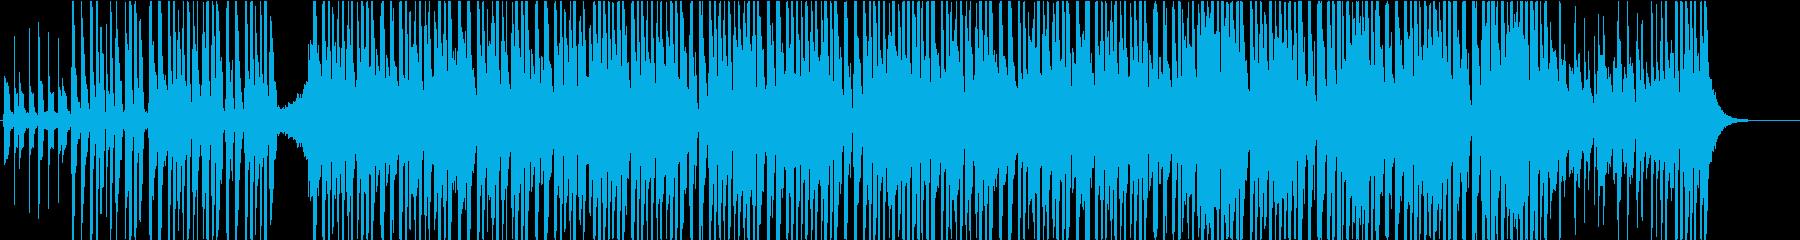 CM向けファンキーではねたビートとブラスの再生済みの波形